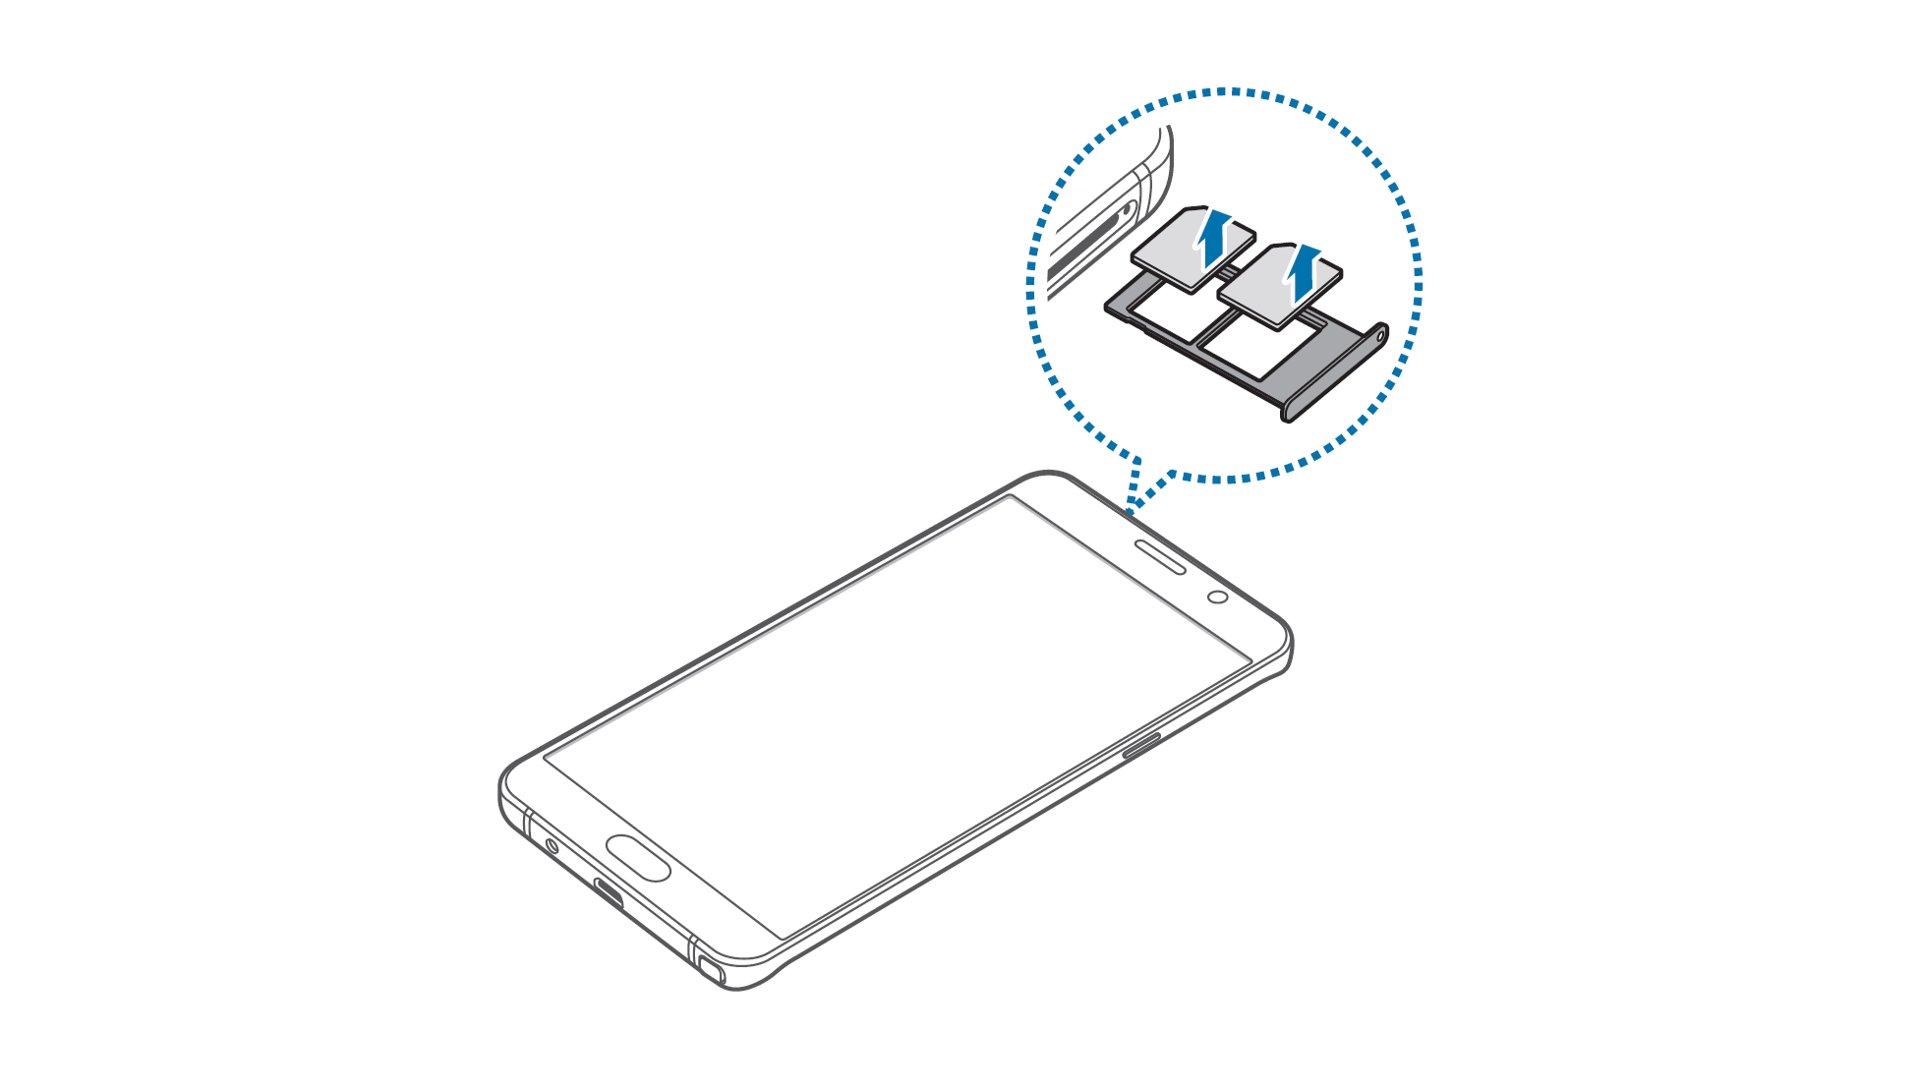 Samsung Galaxy Note 5 - Remove SIM Card In Dual SIM Model